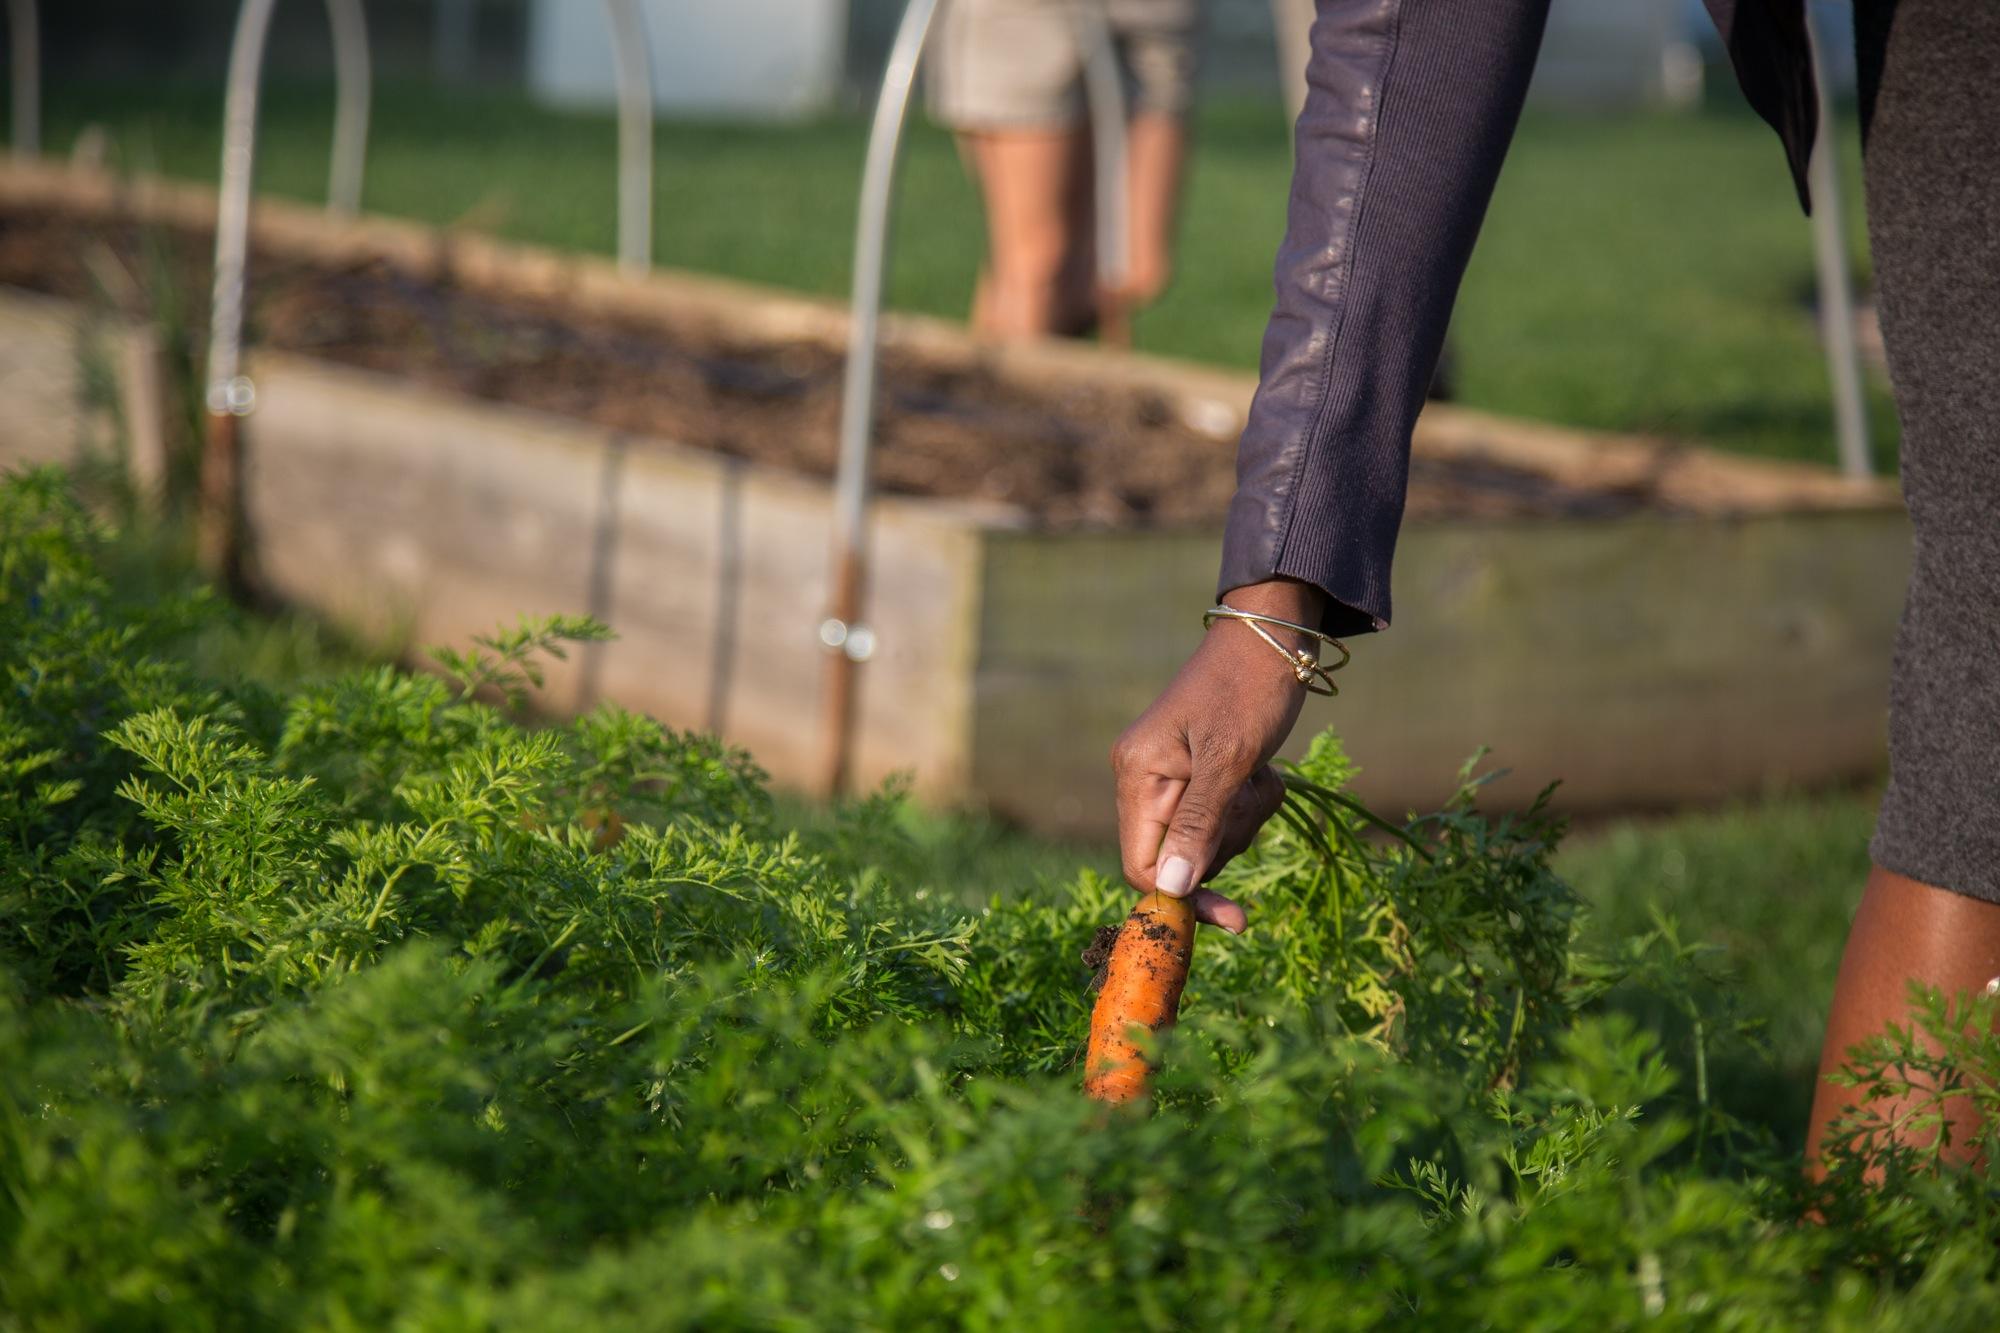 Chinwe Onyekere, picks a carrot from the hospital's Wellness Farm.